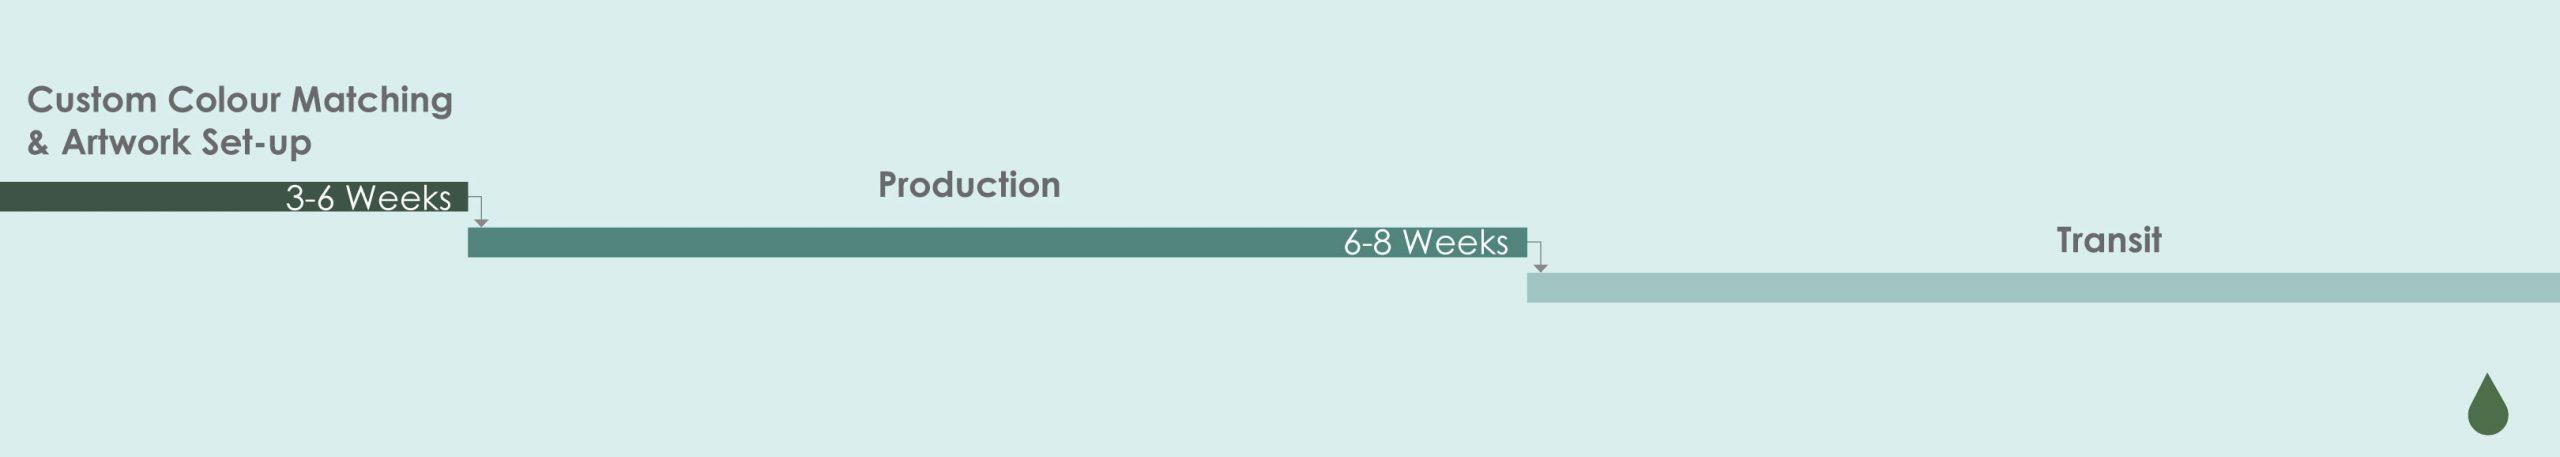 Cannasupplies Custom Production Timeline Estimate overview